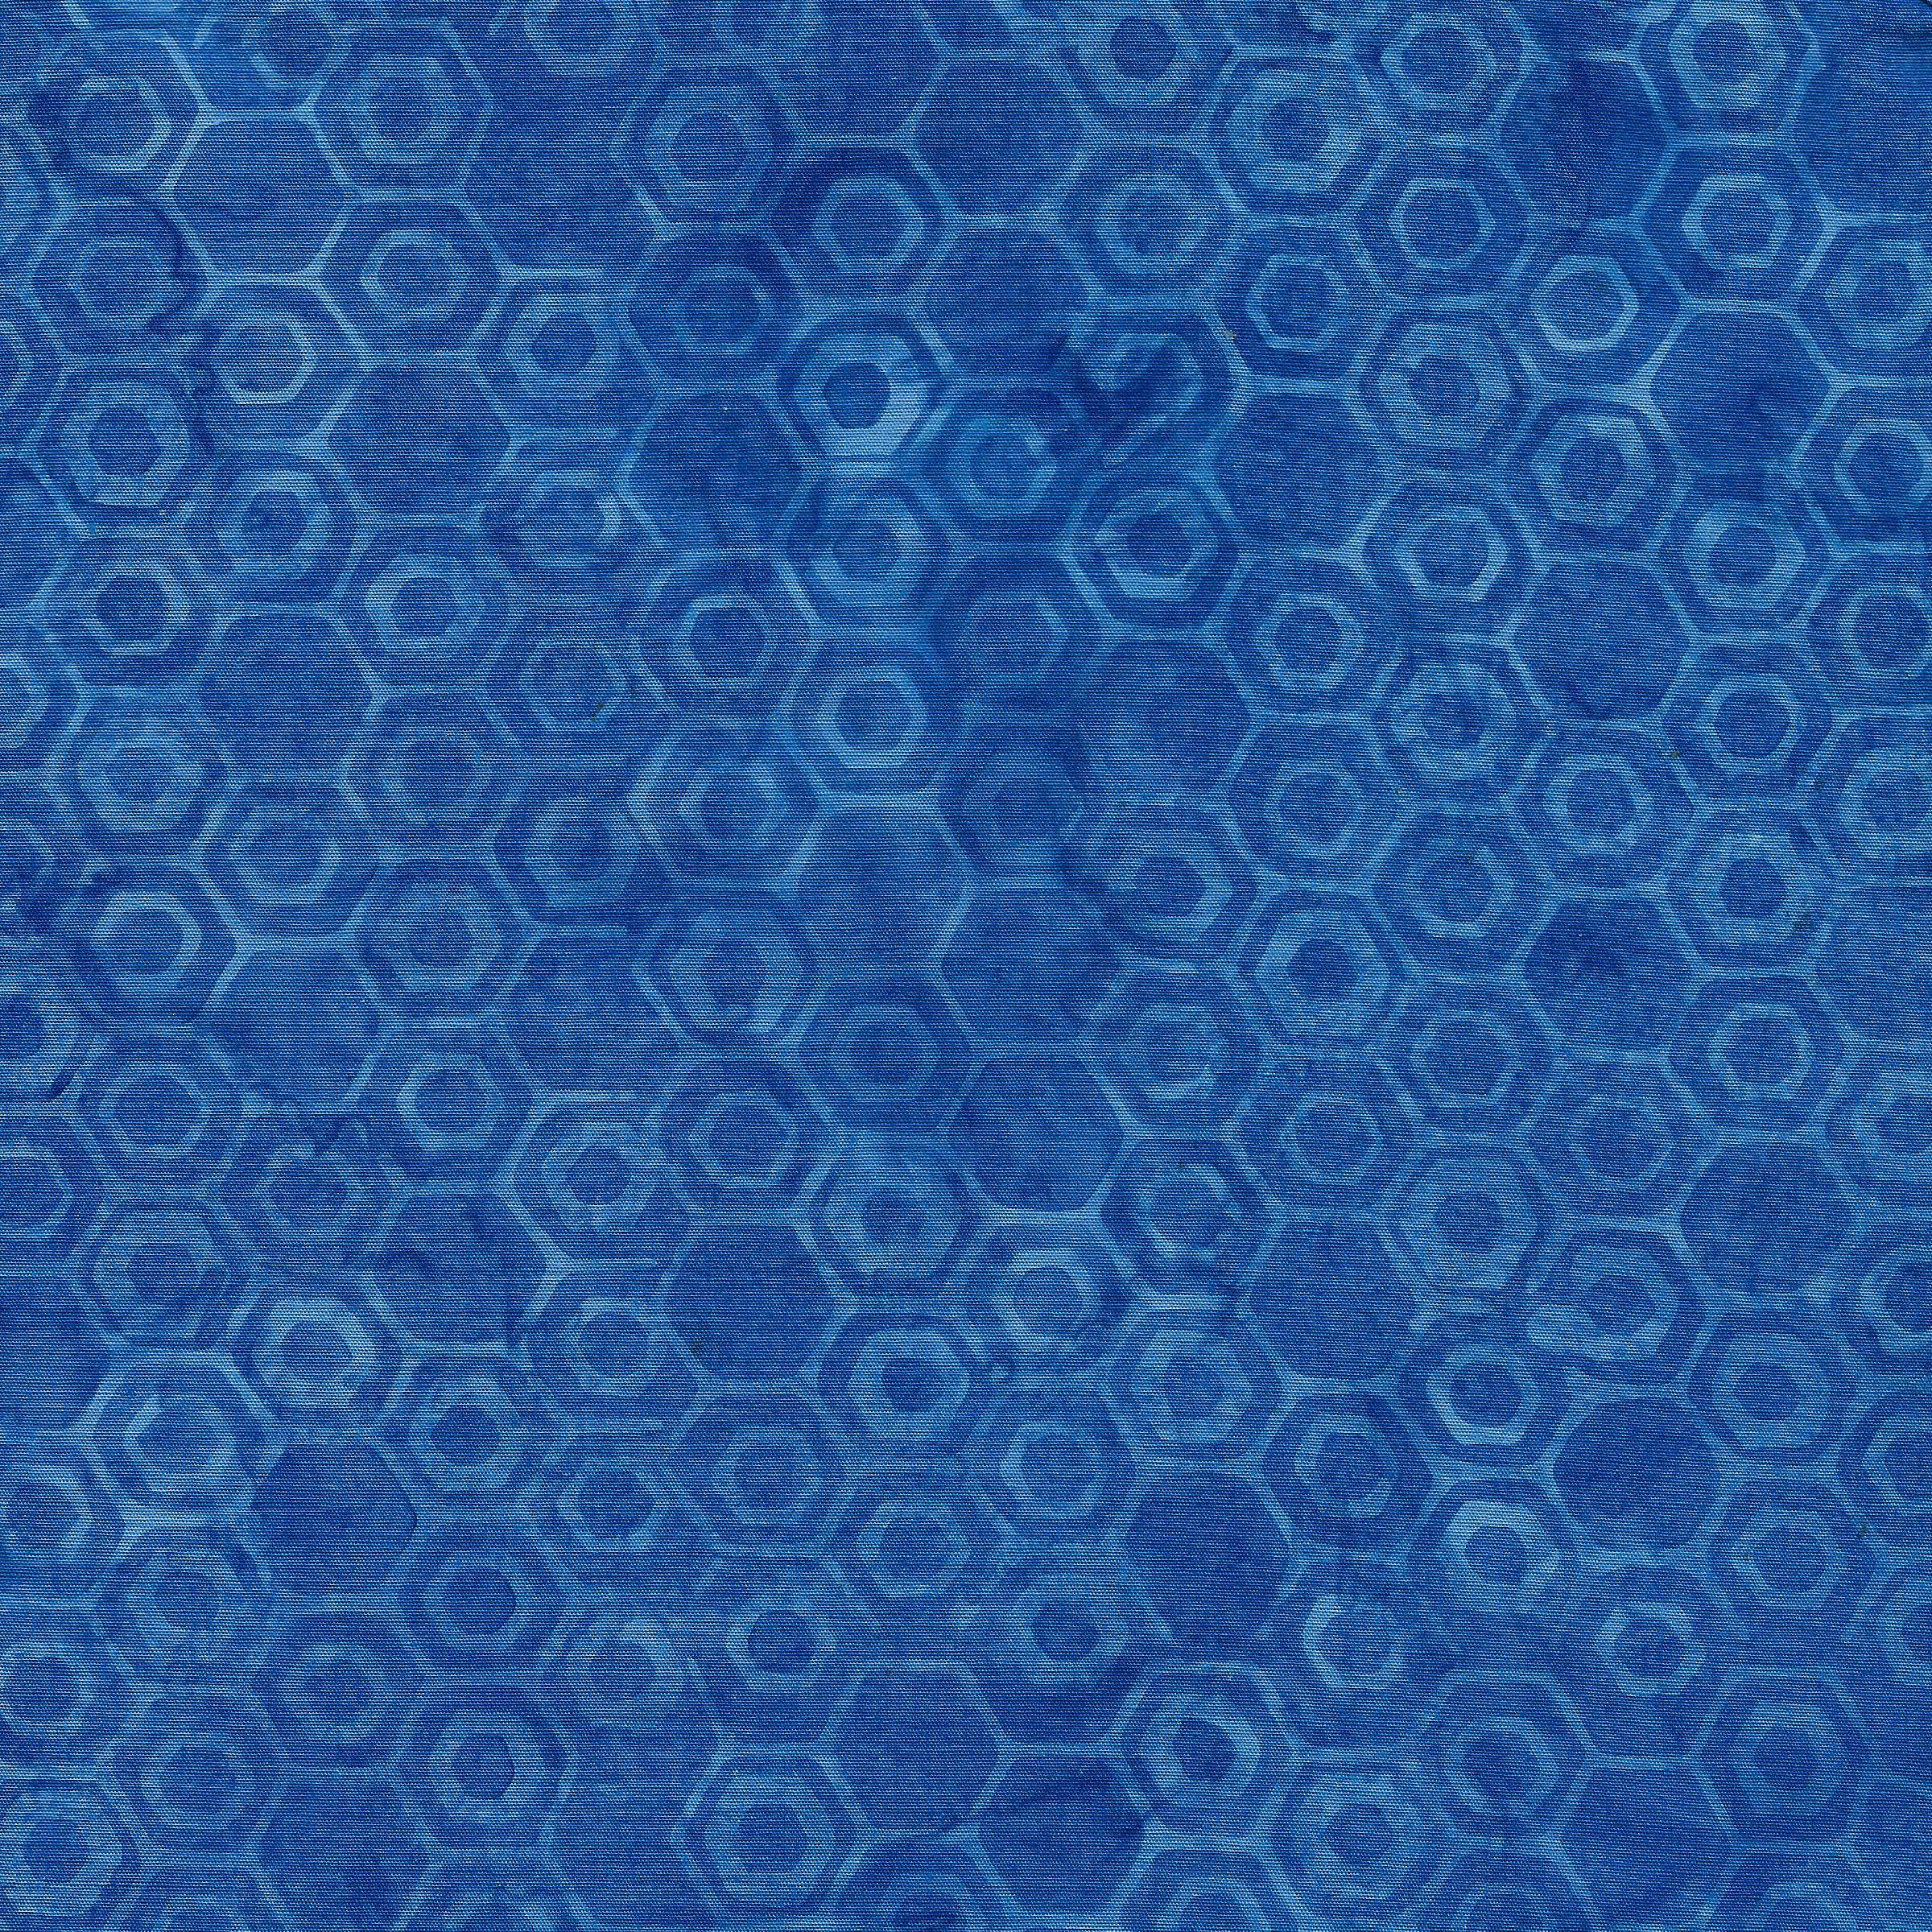 Island Batik Honeycomb-Royal Blue